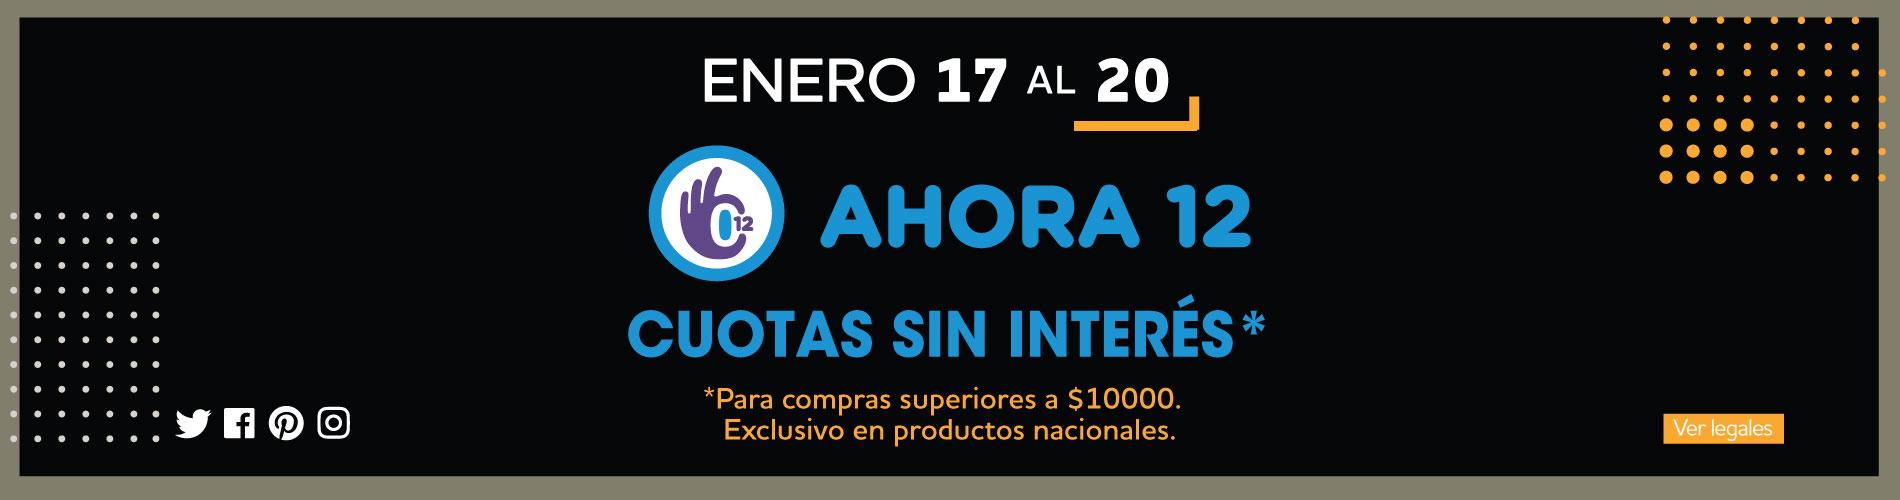 griferias 10-01